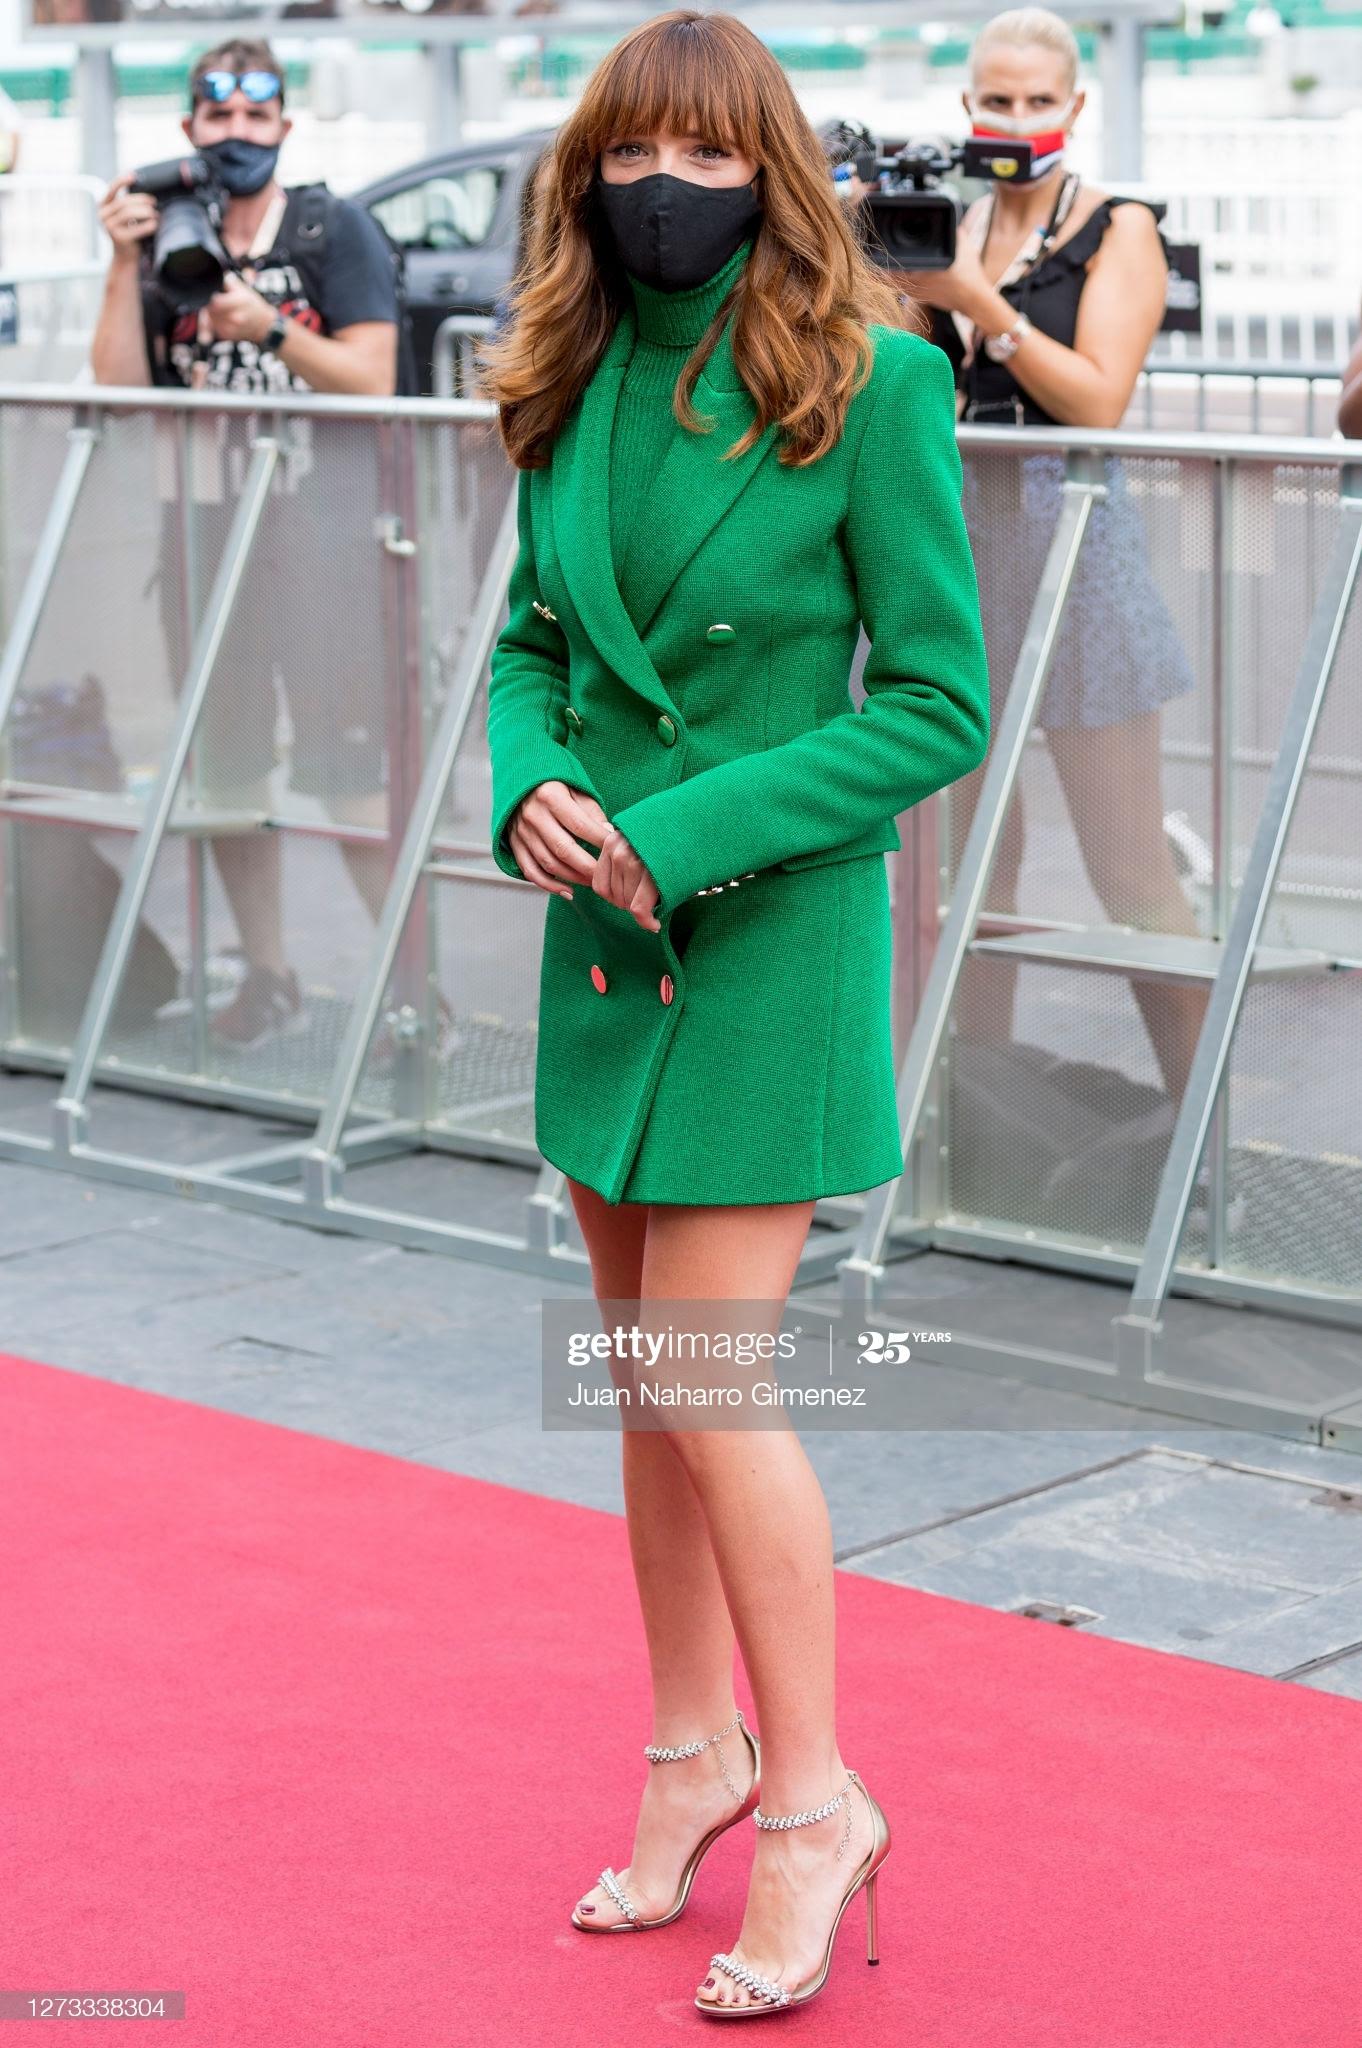 d5ec93c2 1e13 4206 844d 35029d684841 - Festival de San Sebastián: Todas las celebrities que han lucido Jimmy Choo y Elisabetta Franchi en la alfombra roja